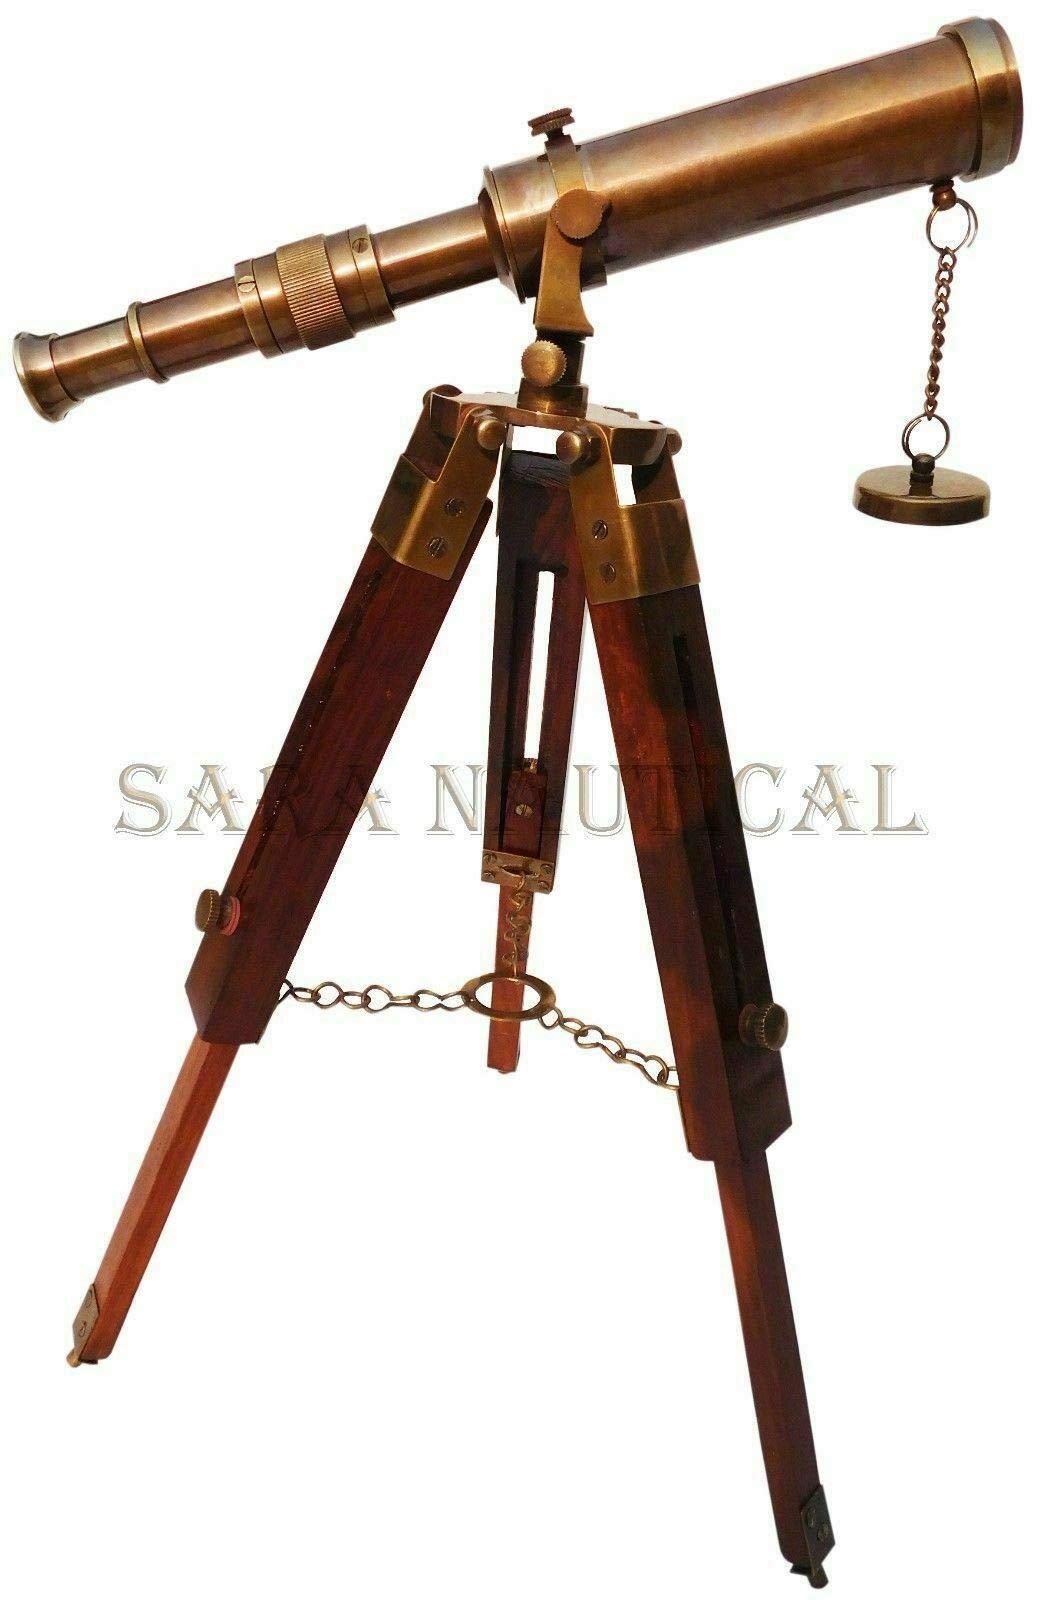 PIRU Antique Brass Telescope with Collectible Wooden Tripod Stand Vintage Desk Decor